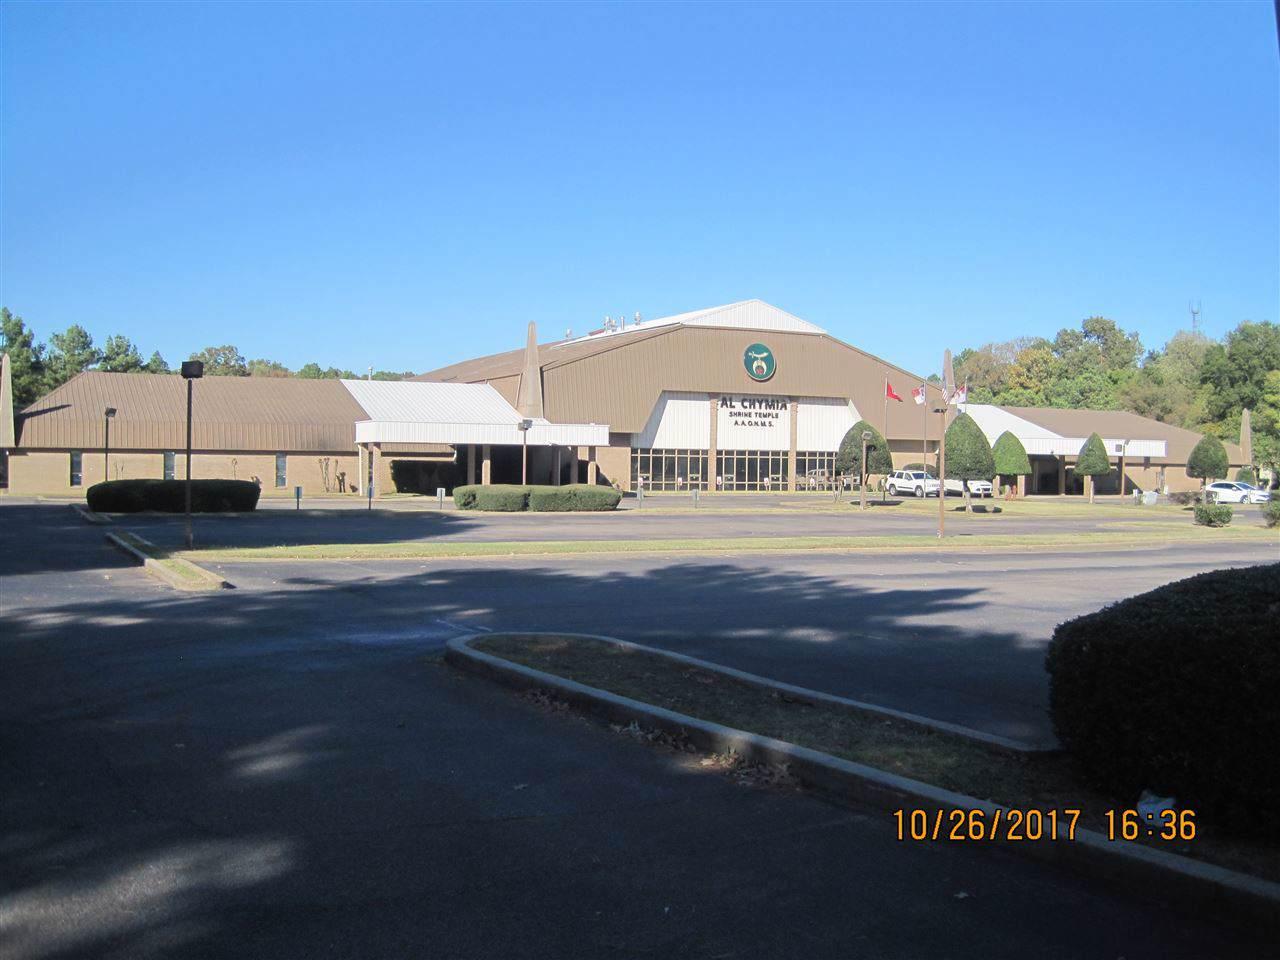 5770 Shelby Oaks Dr - Photo 1